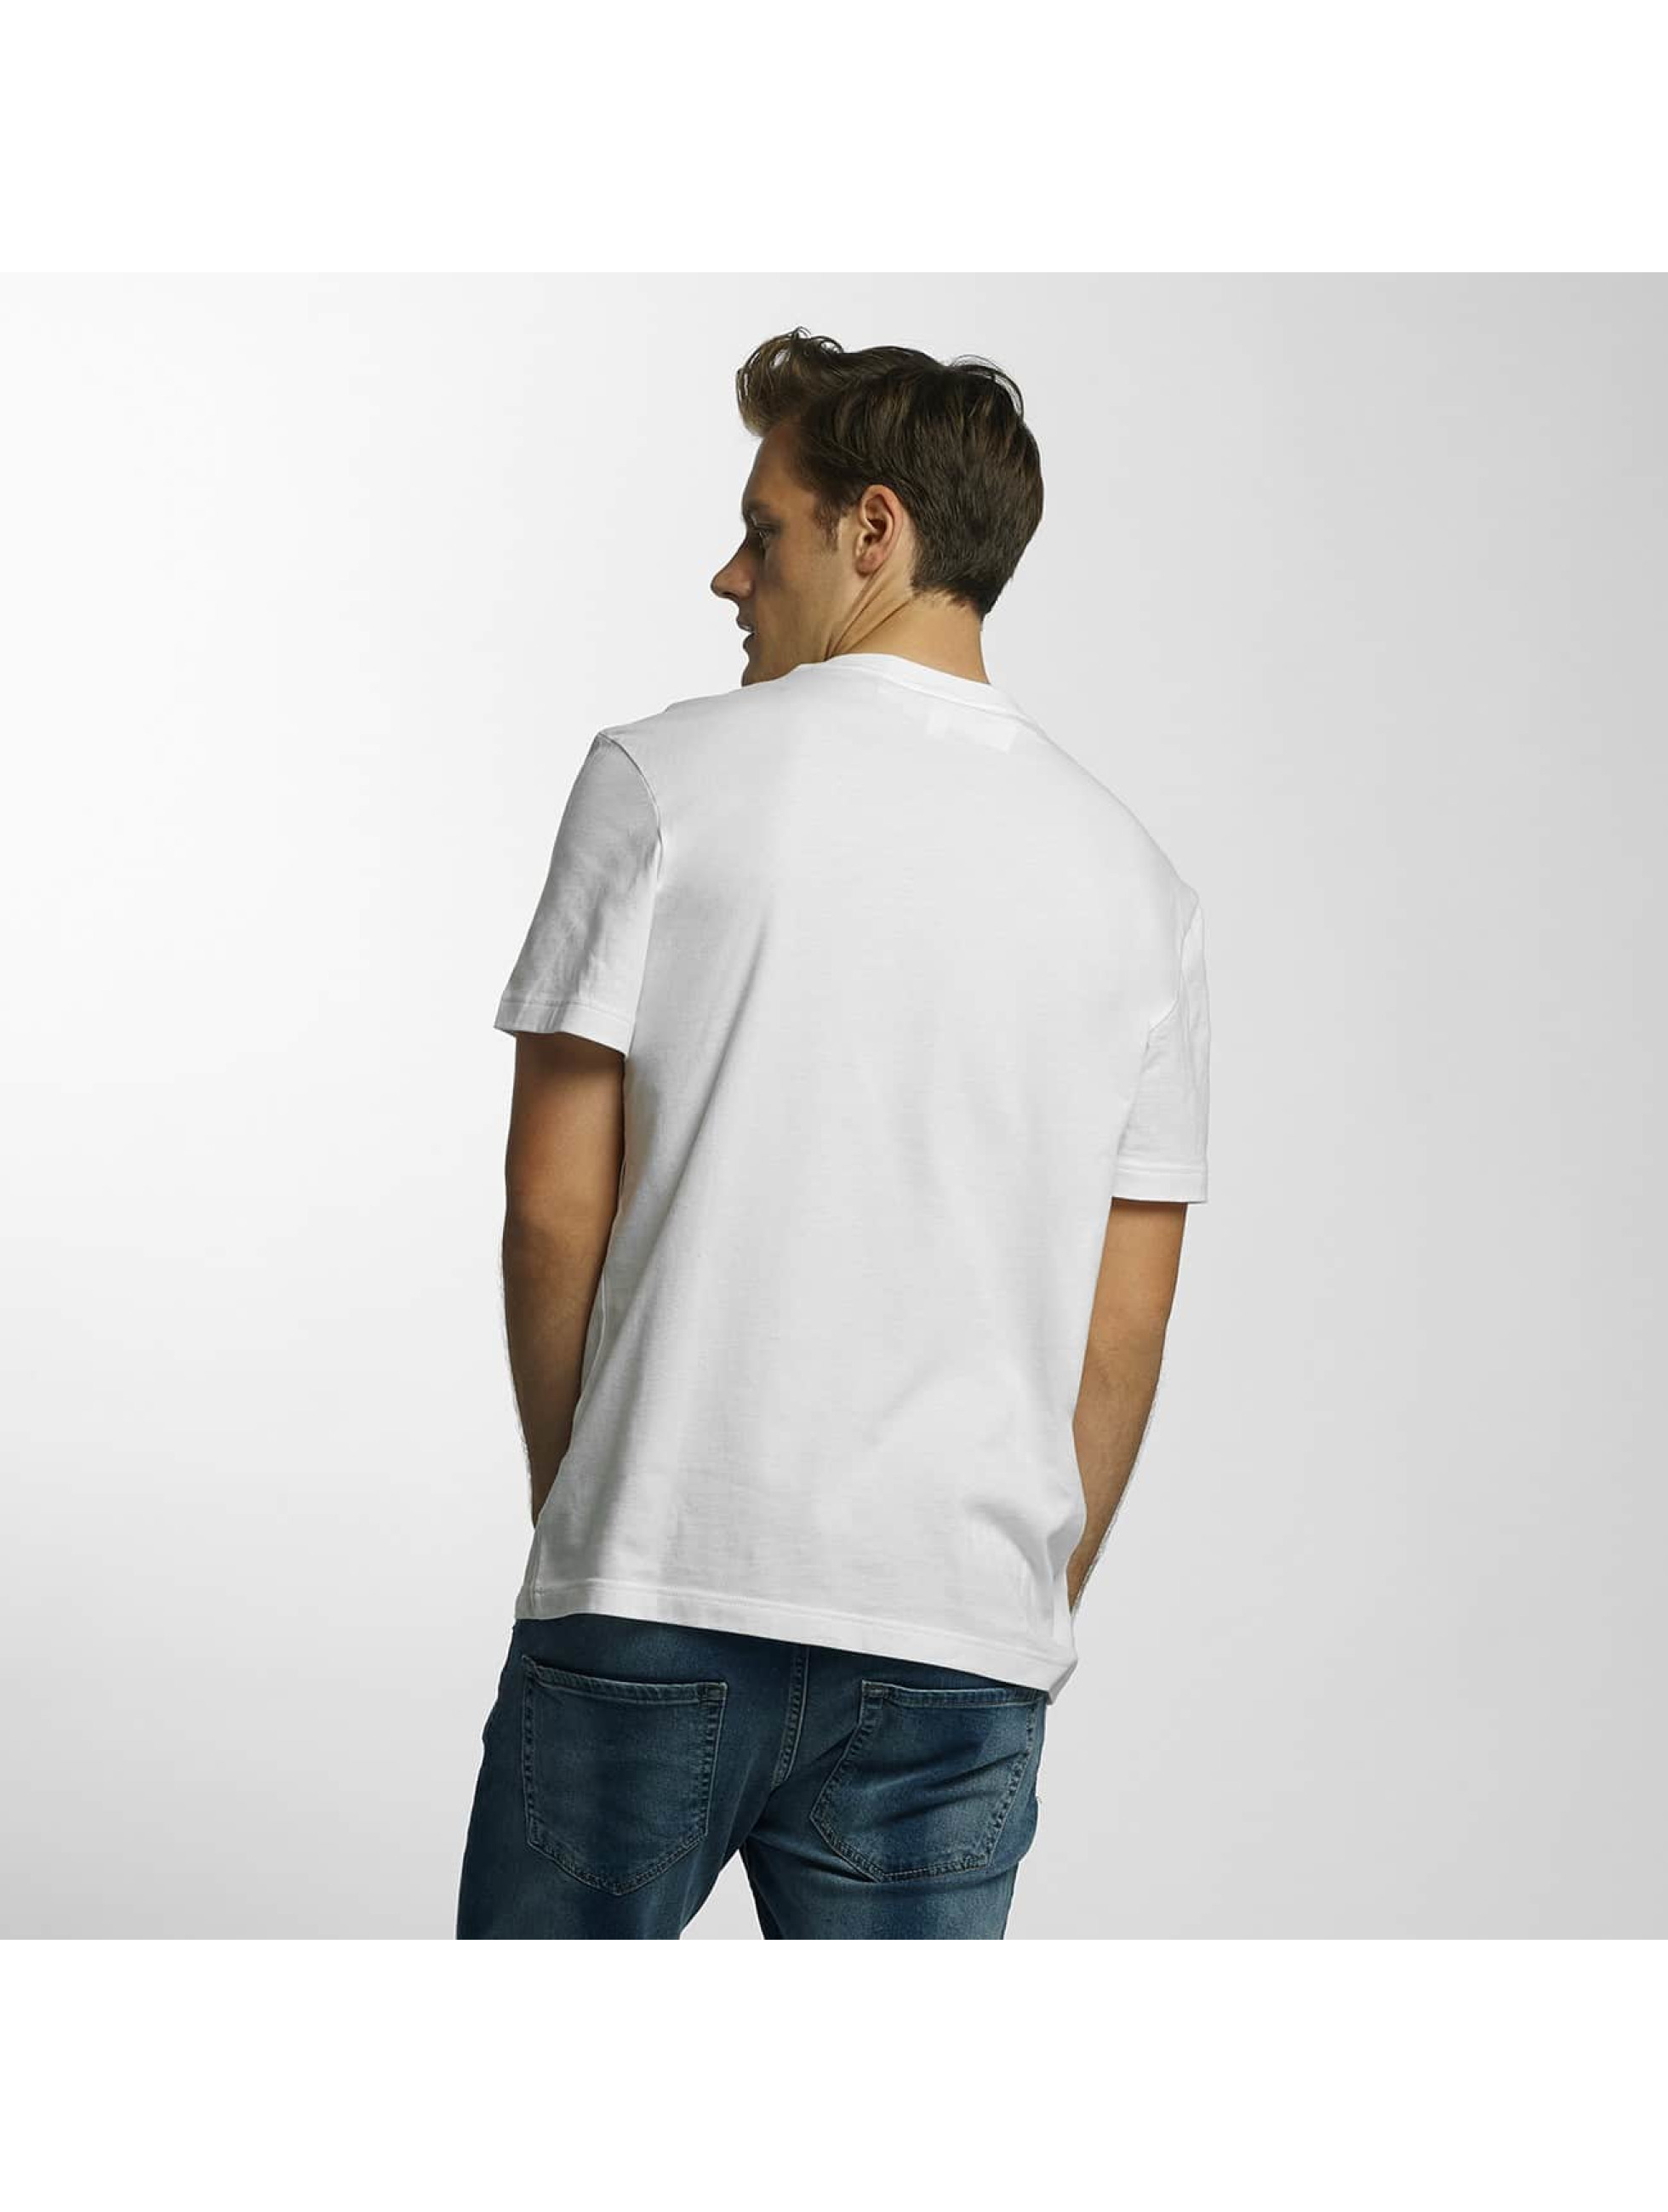 Lacoste Classic T-Shirt Original white